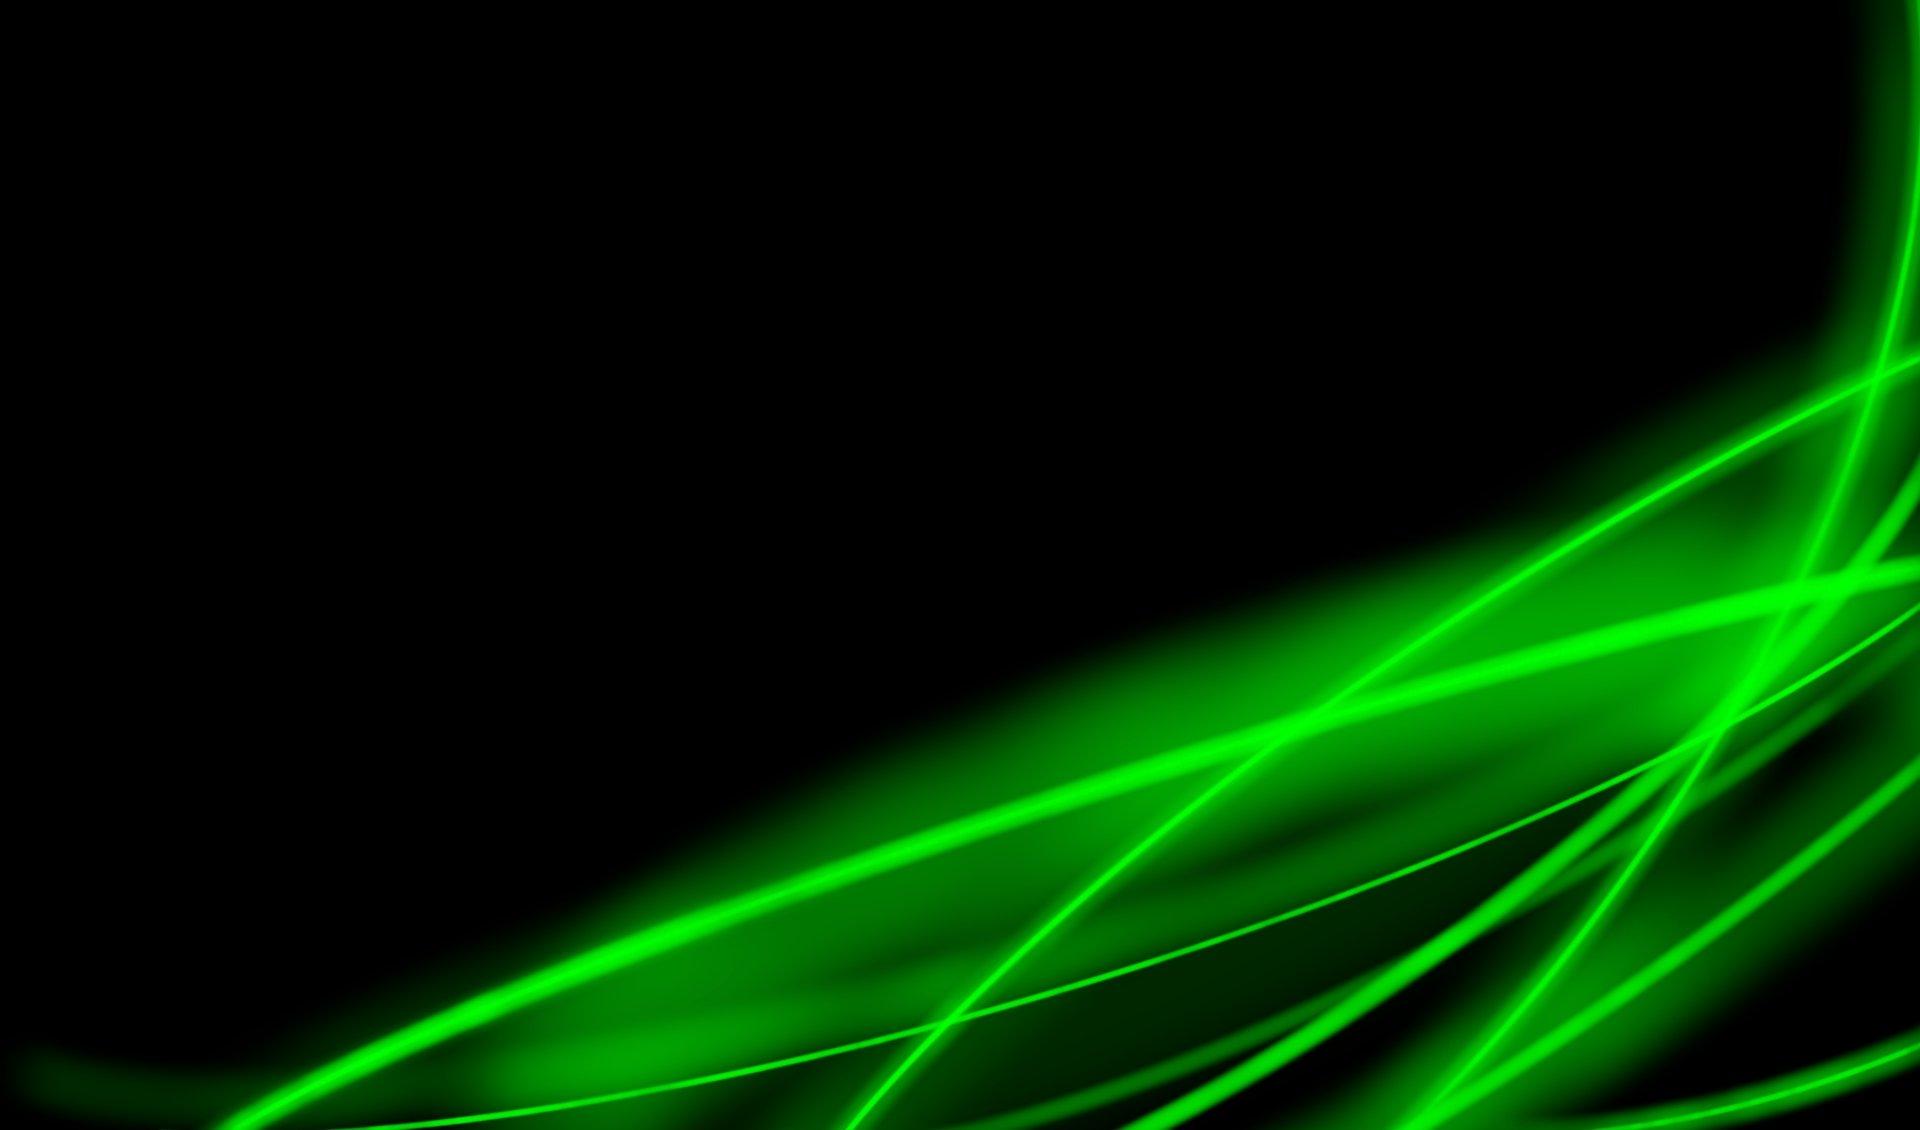 neon green wallpaper background wallpapersafari